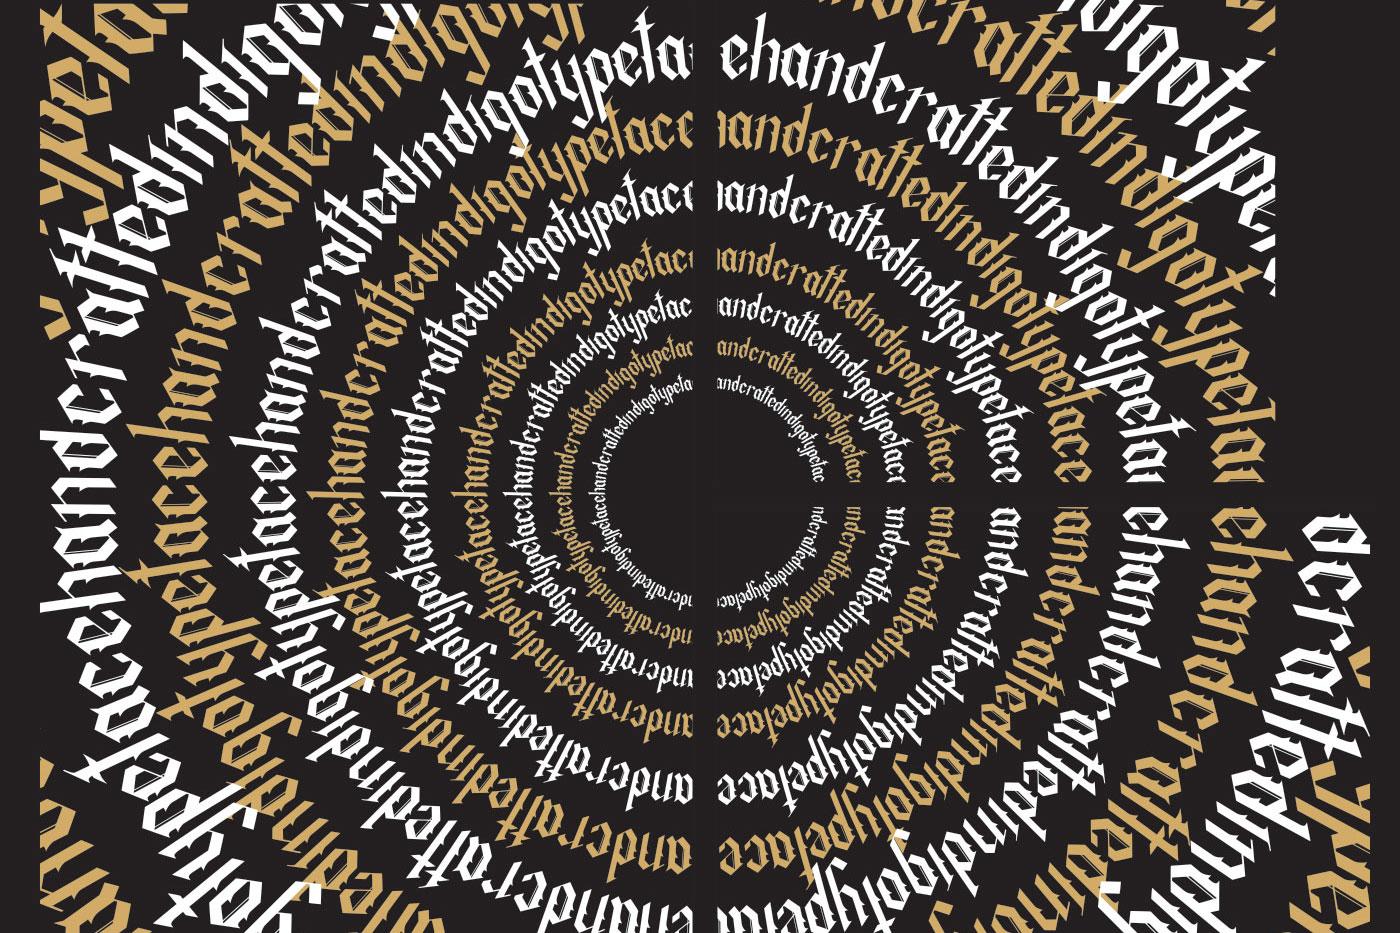 Indigo handcrafted typeface example image 4